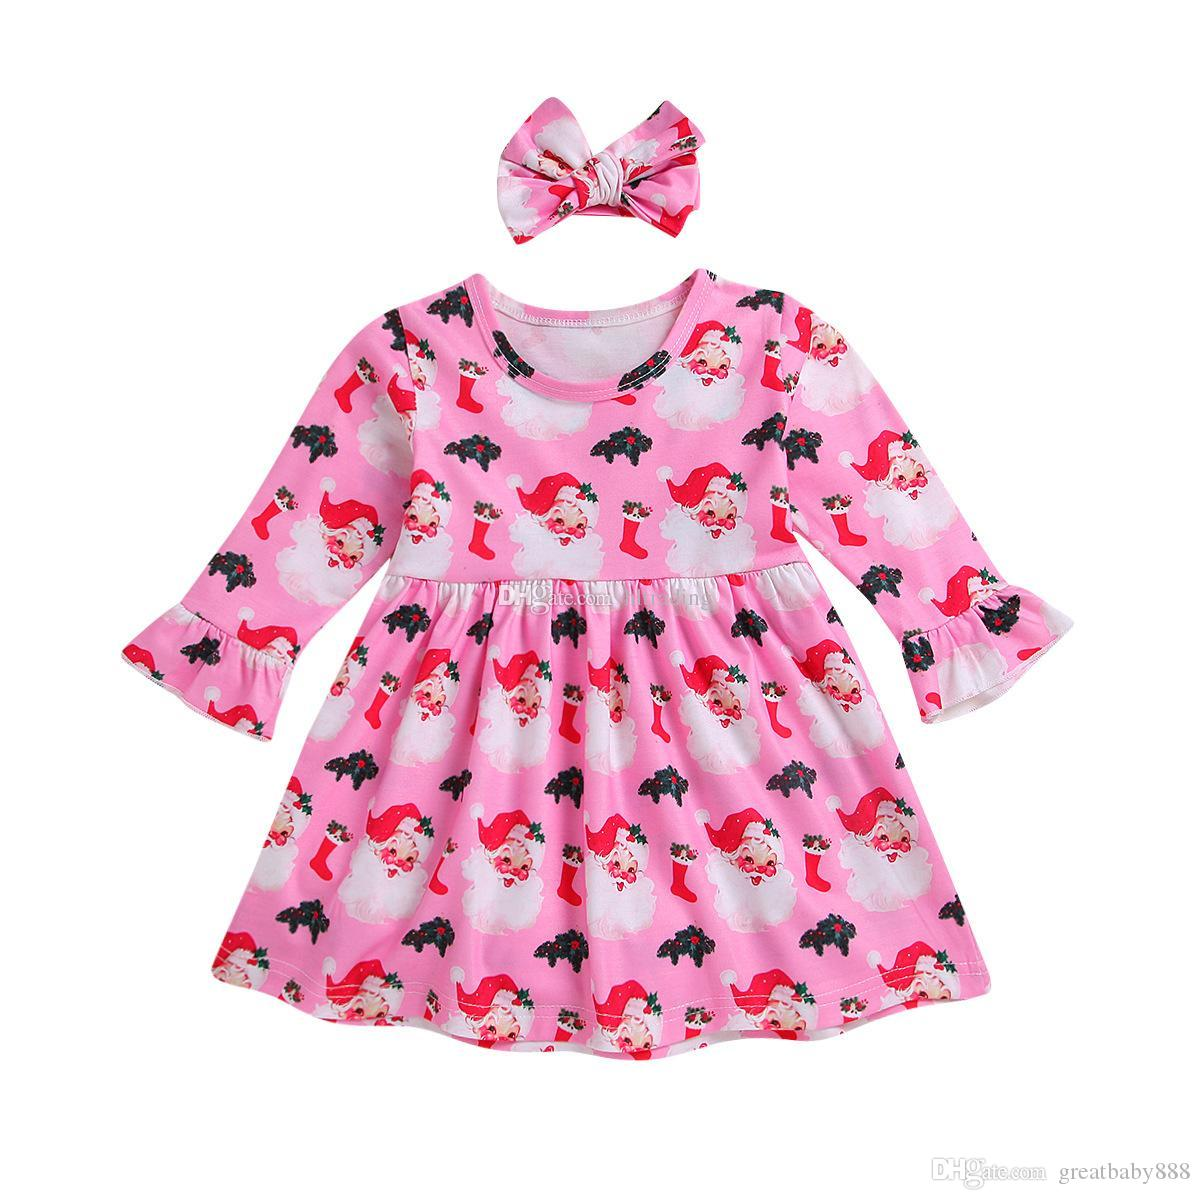 3bda3d10fd89 Baby Girls Christmas Dress Children Santa Claus Print Princess Dress ...